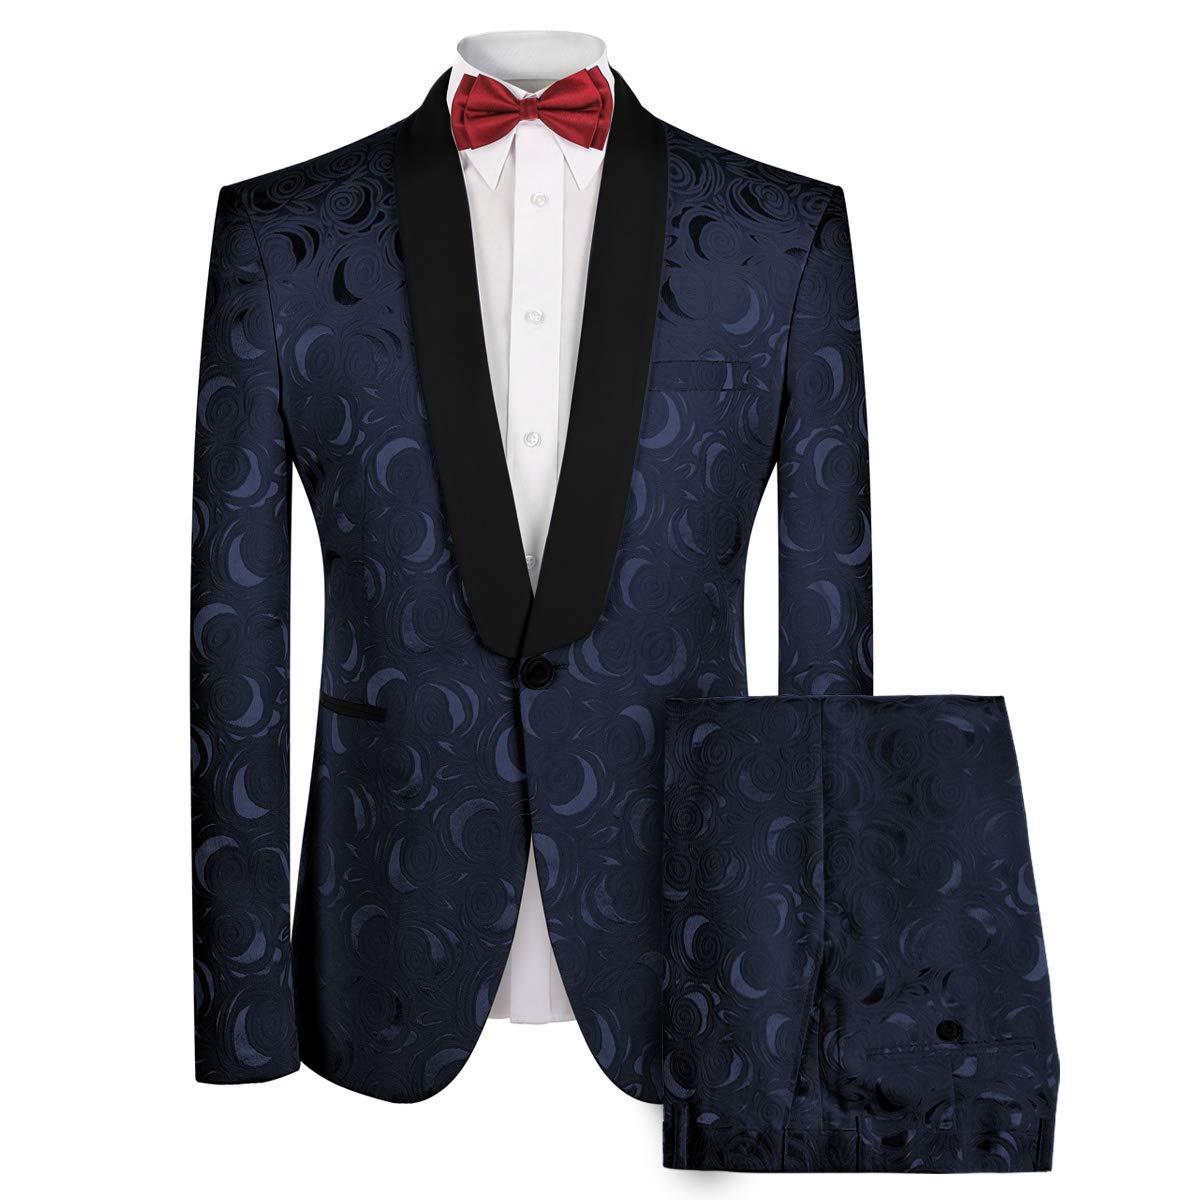 MAGE MALE Men's 2-Piece Floral Printed Suit Slim Fit Elegant Single Breasted Notch Lapel Wedding Blazer Pants Sets